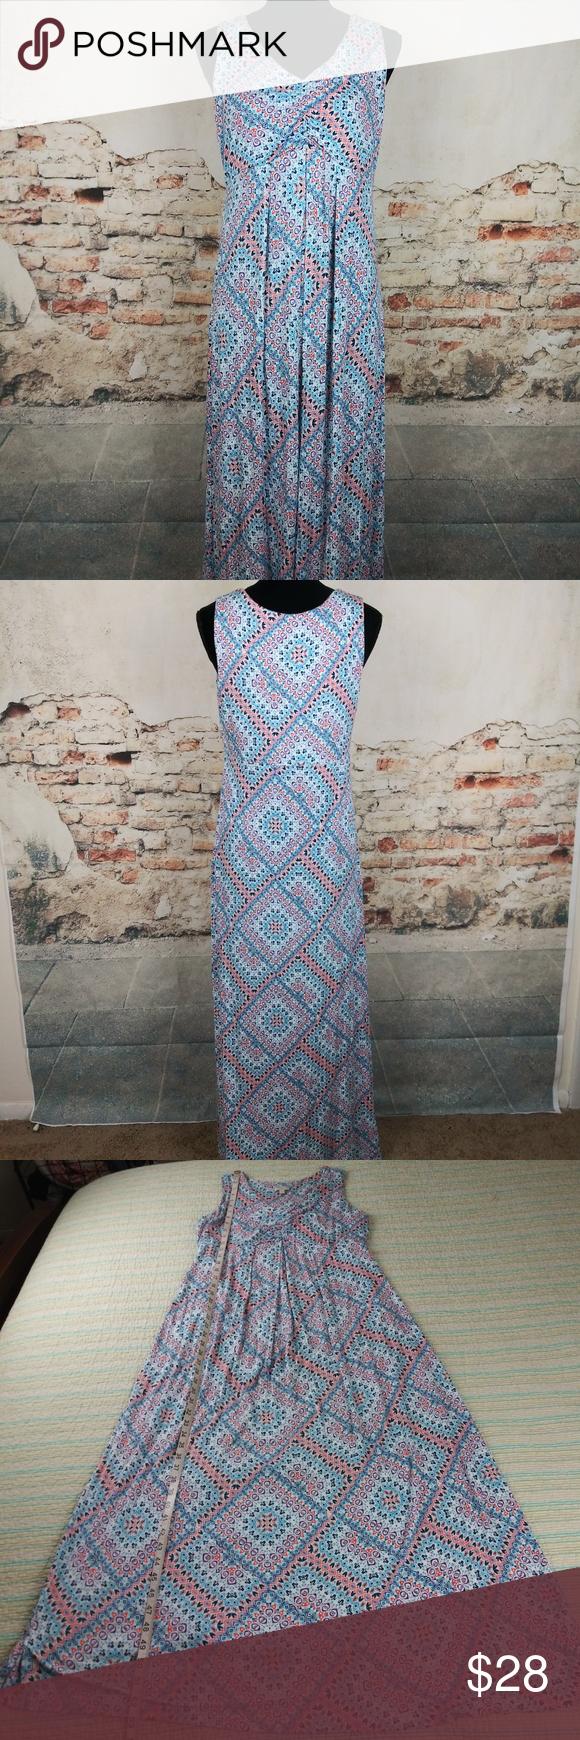 Talbots Lp Multicolor Blue Coral Jersey Maxi Dress Maxi Jersey Dress Maxi Knit Dress Maxi Dress [ 1740 x 580 Pixel ]